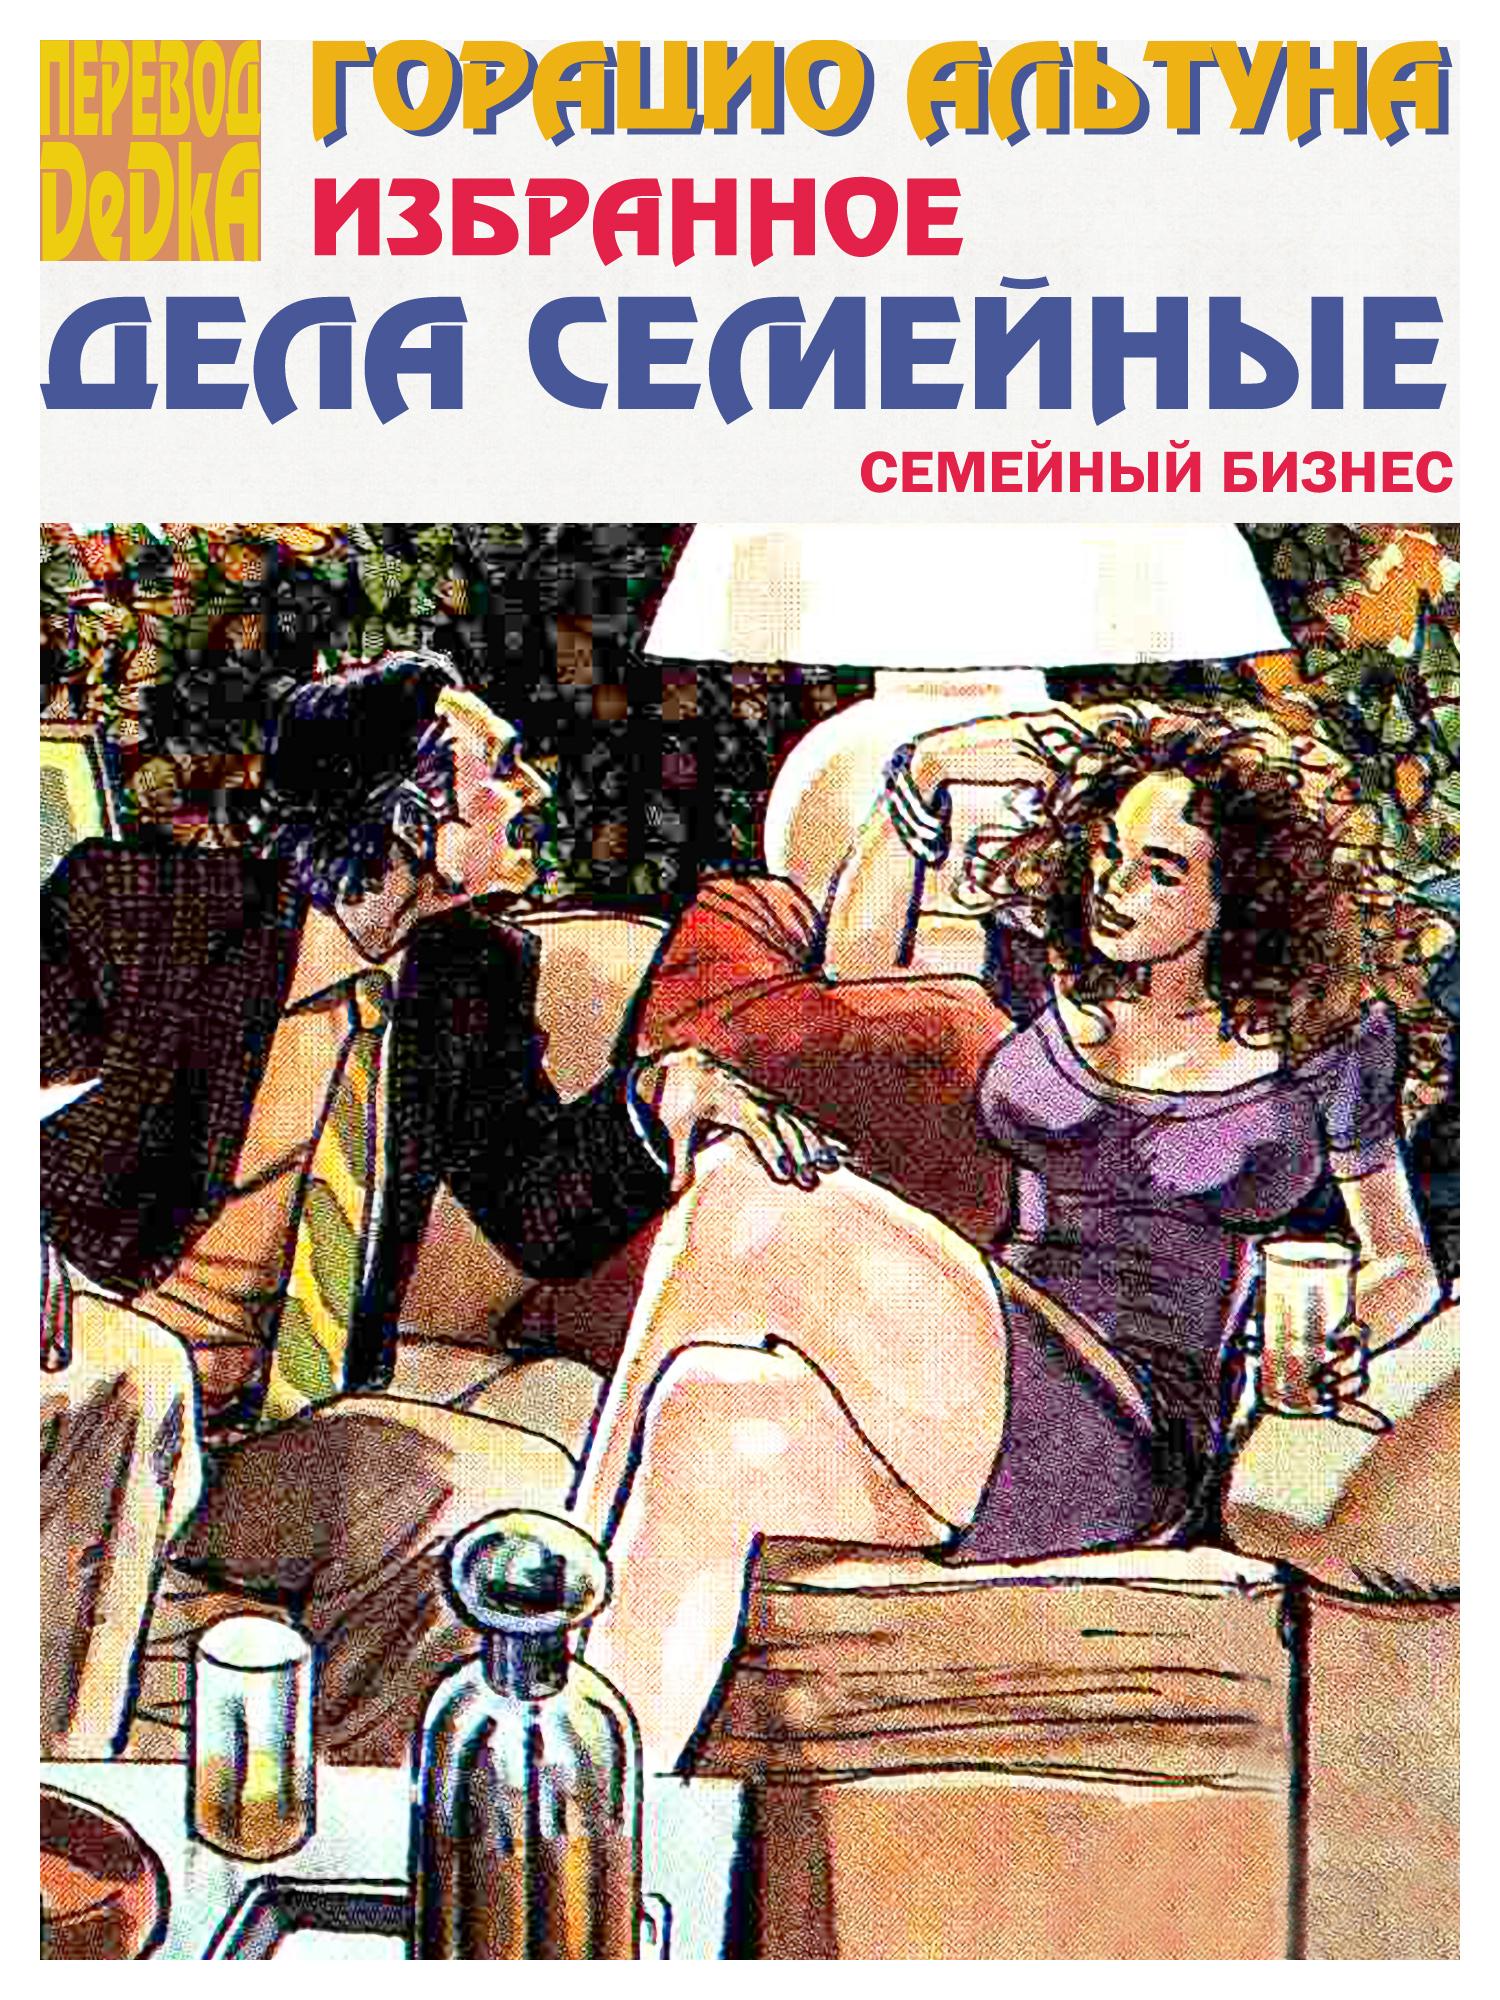 Секс комиксы ретро бесплатно